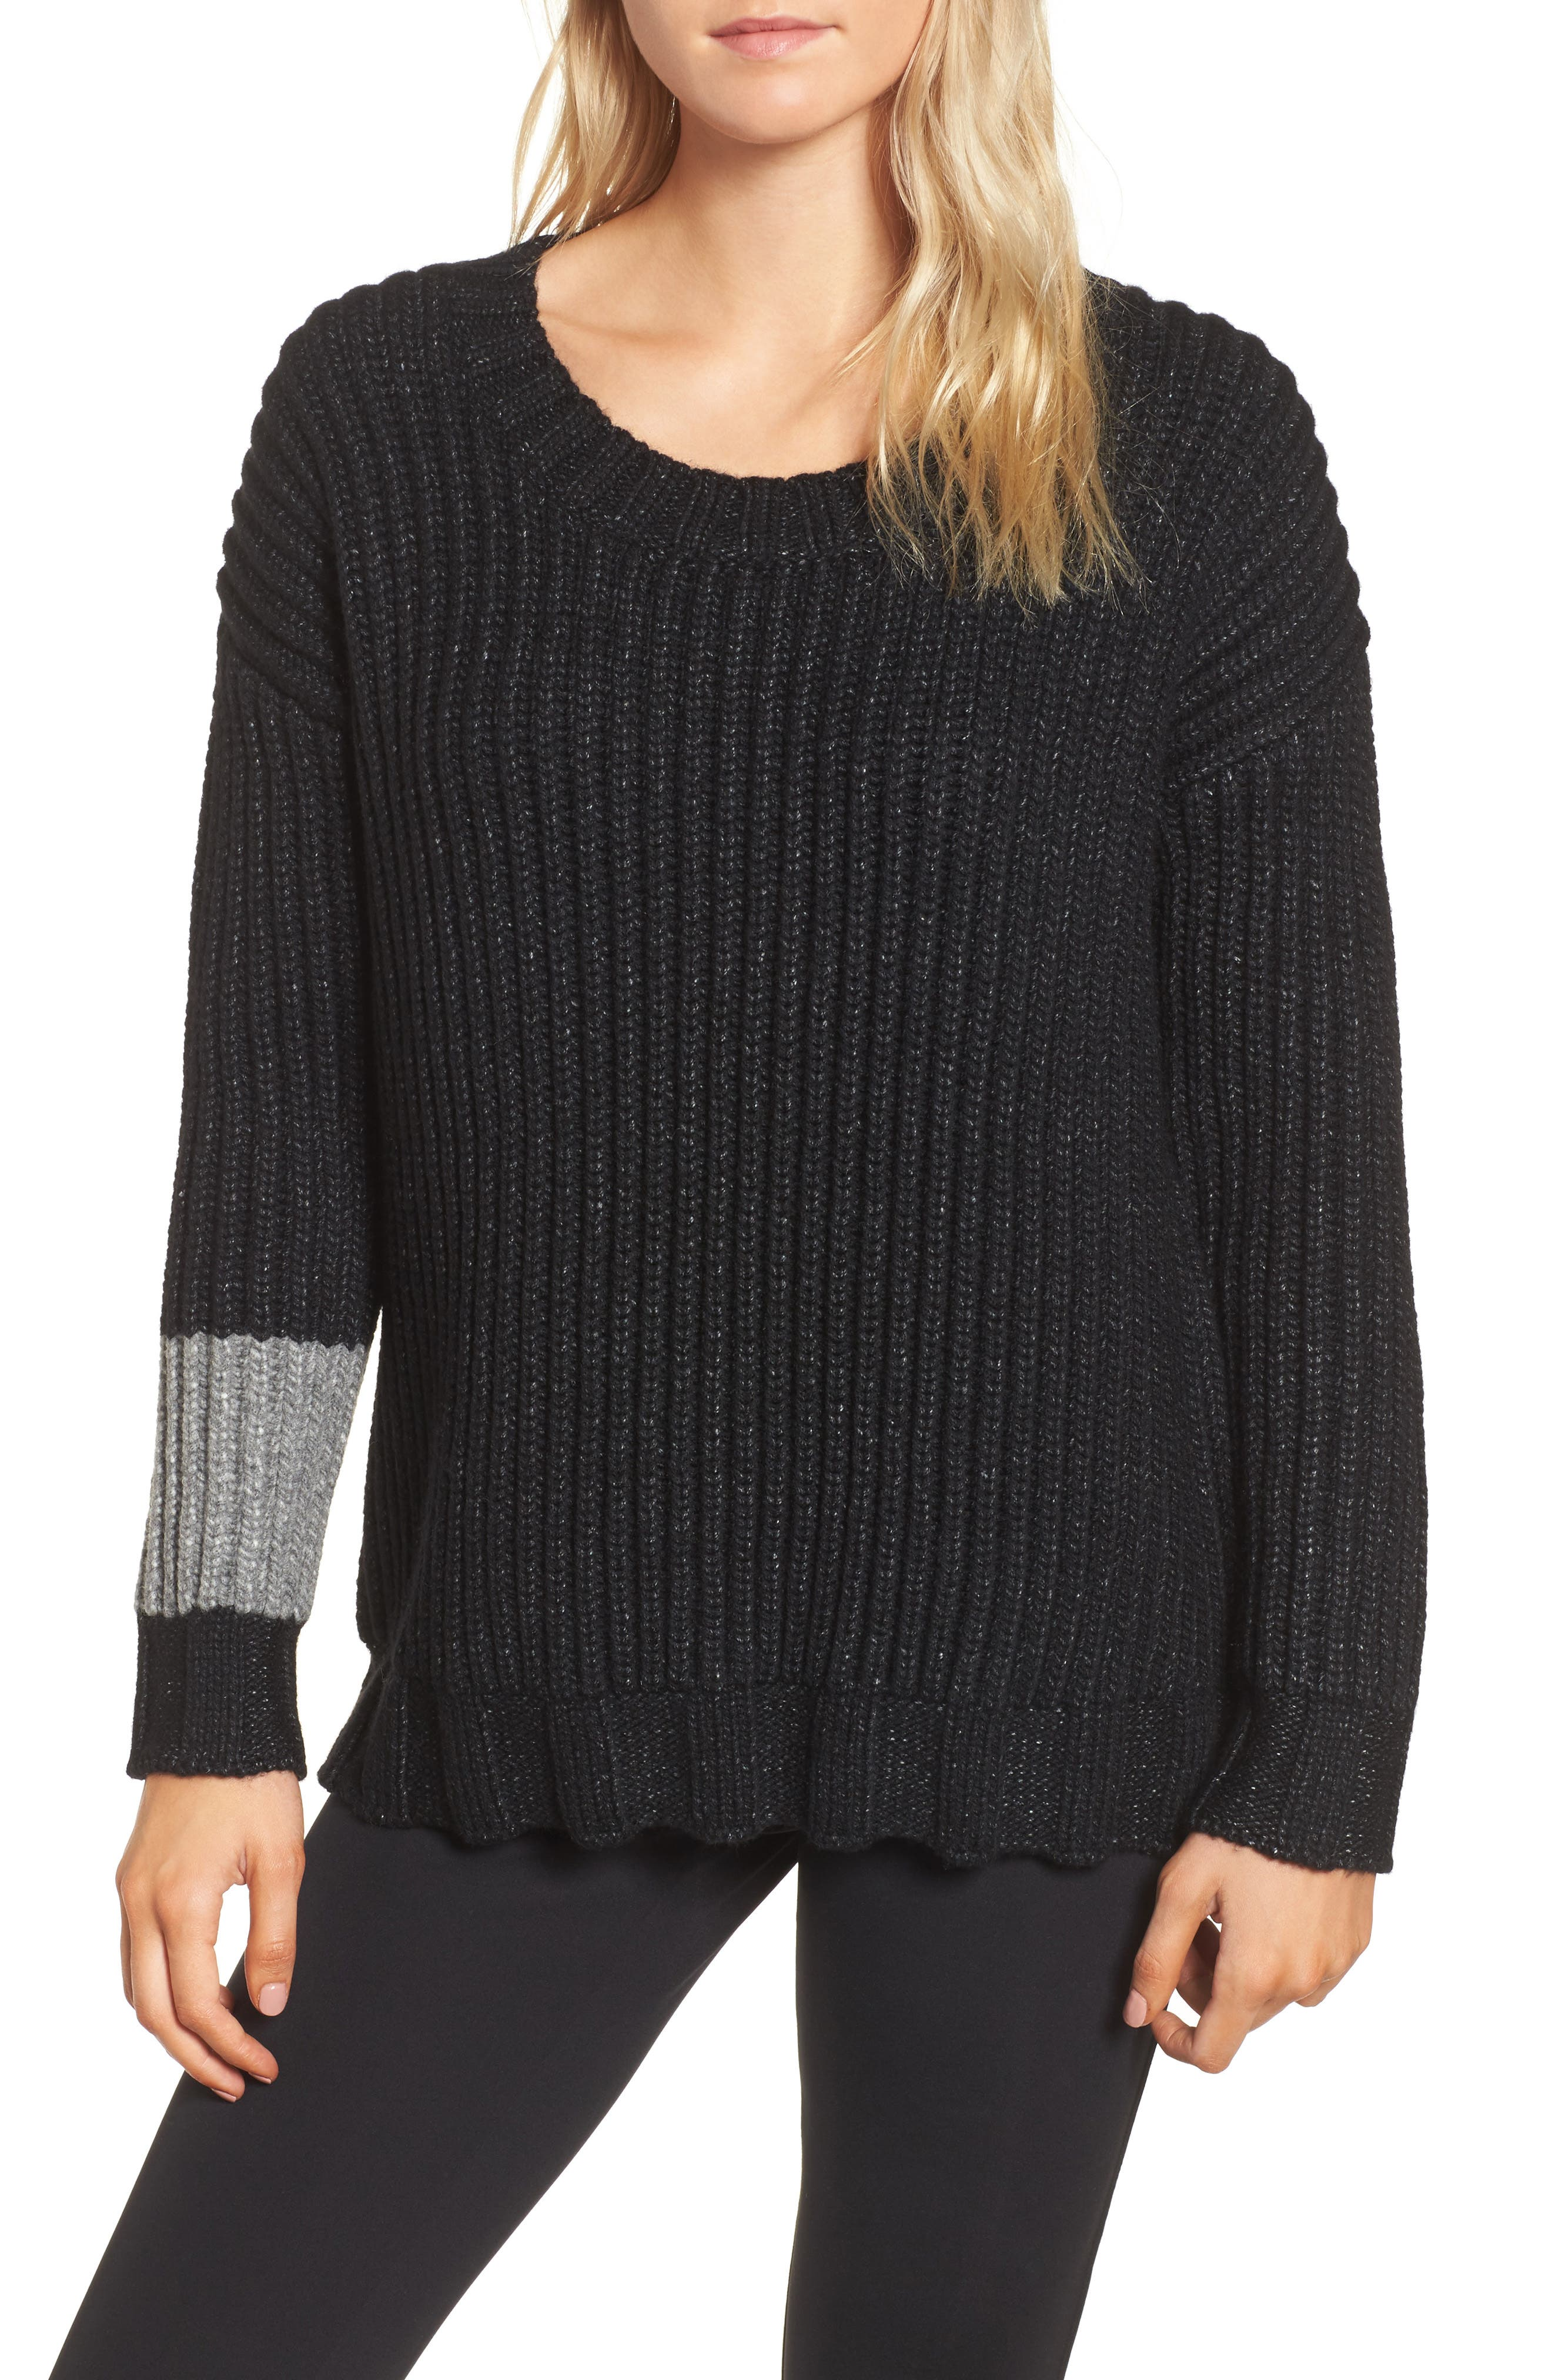 Chunky Armband Sweater,                         Main,                         color, Black/ Heather Grey